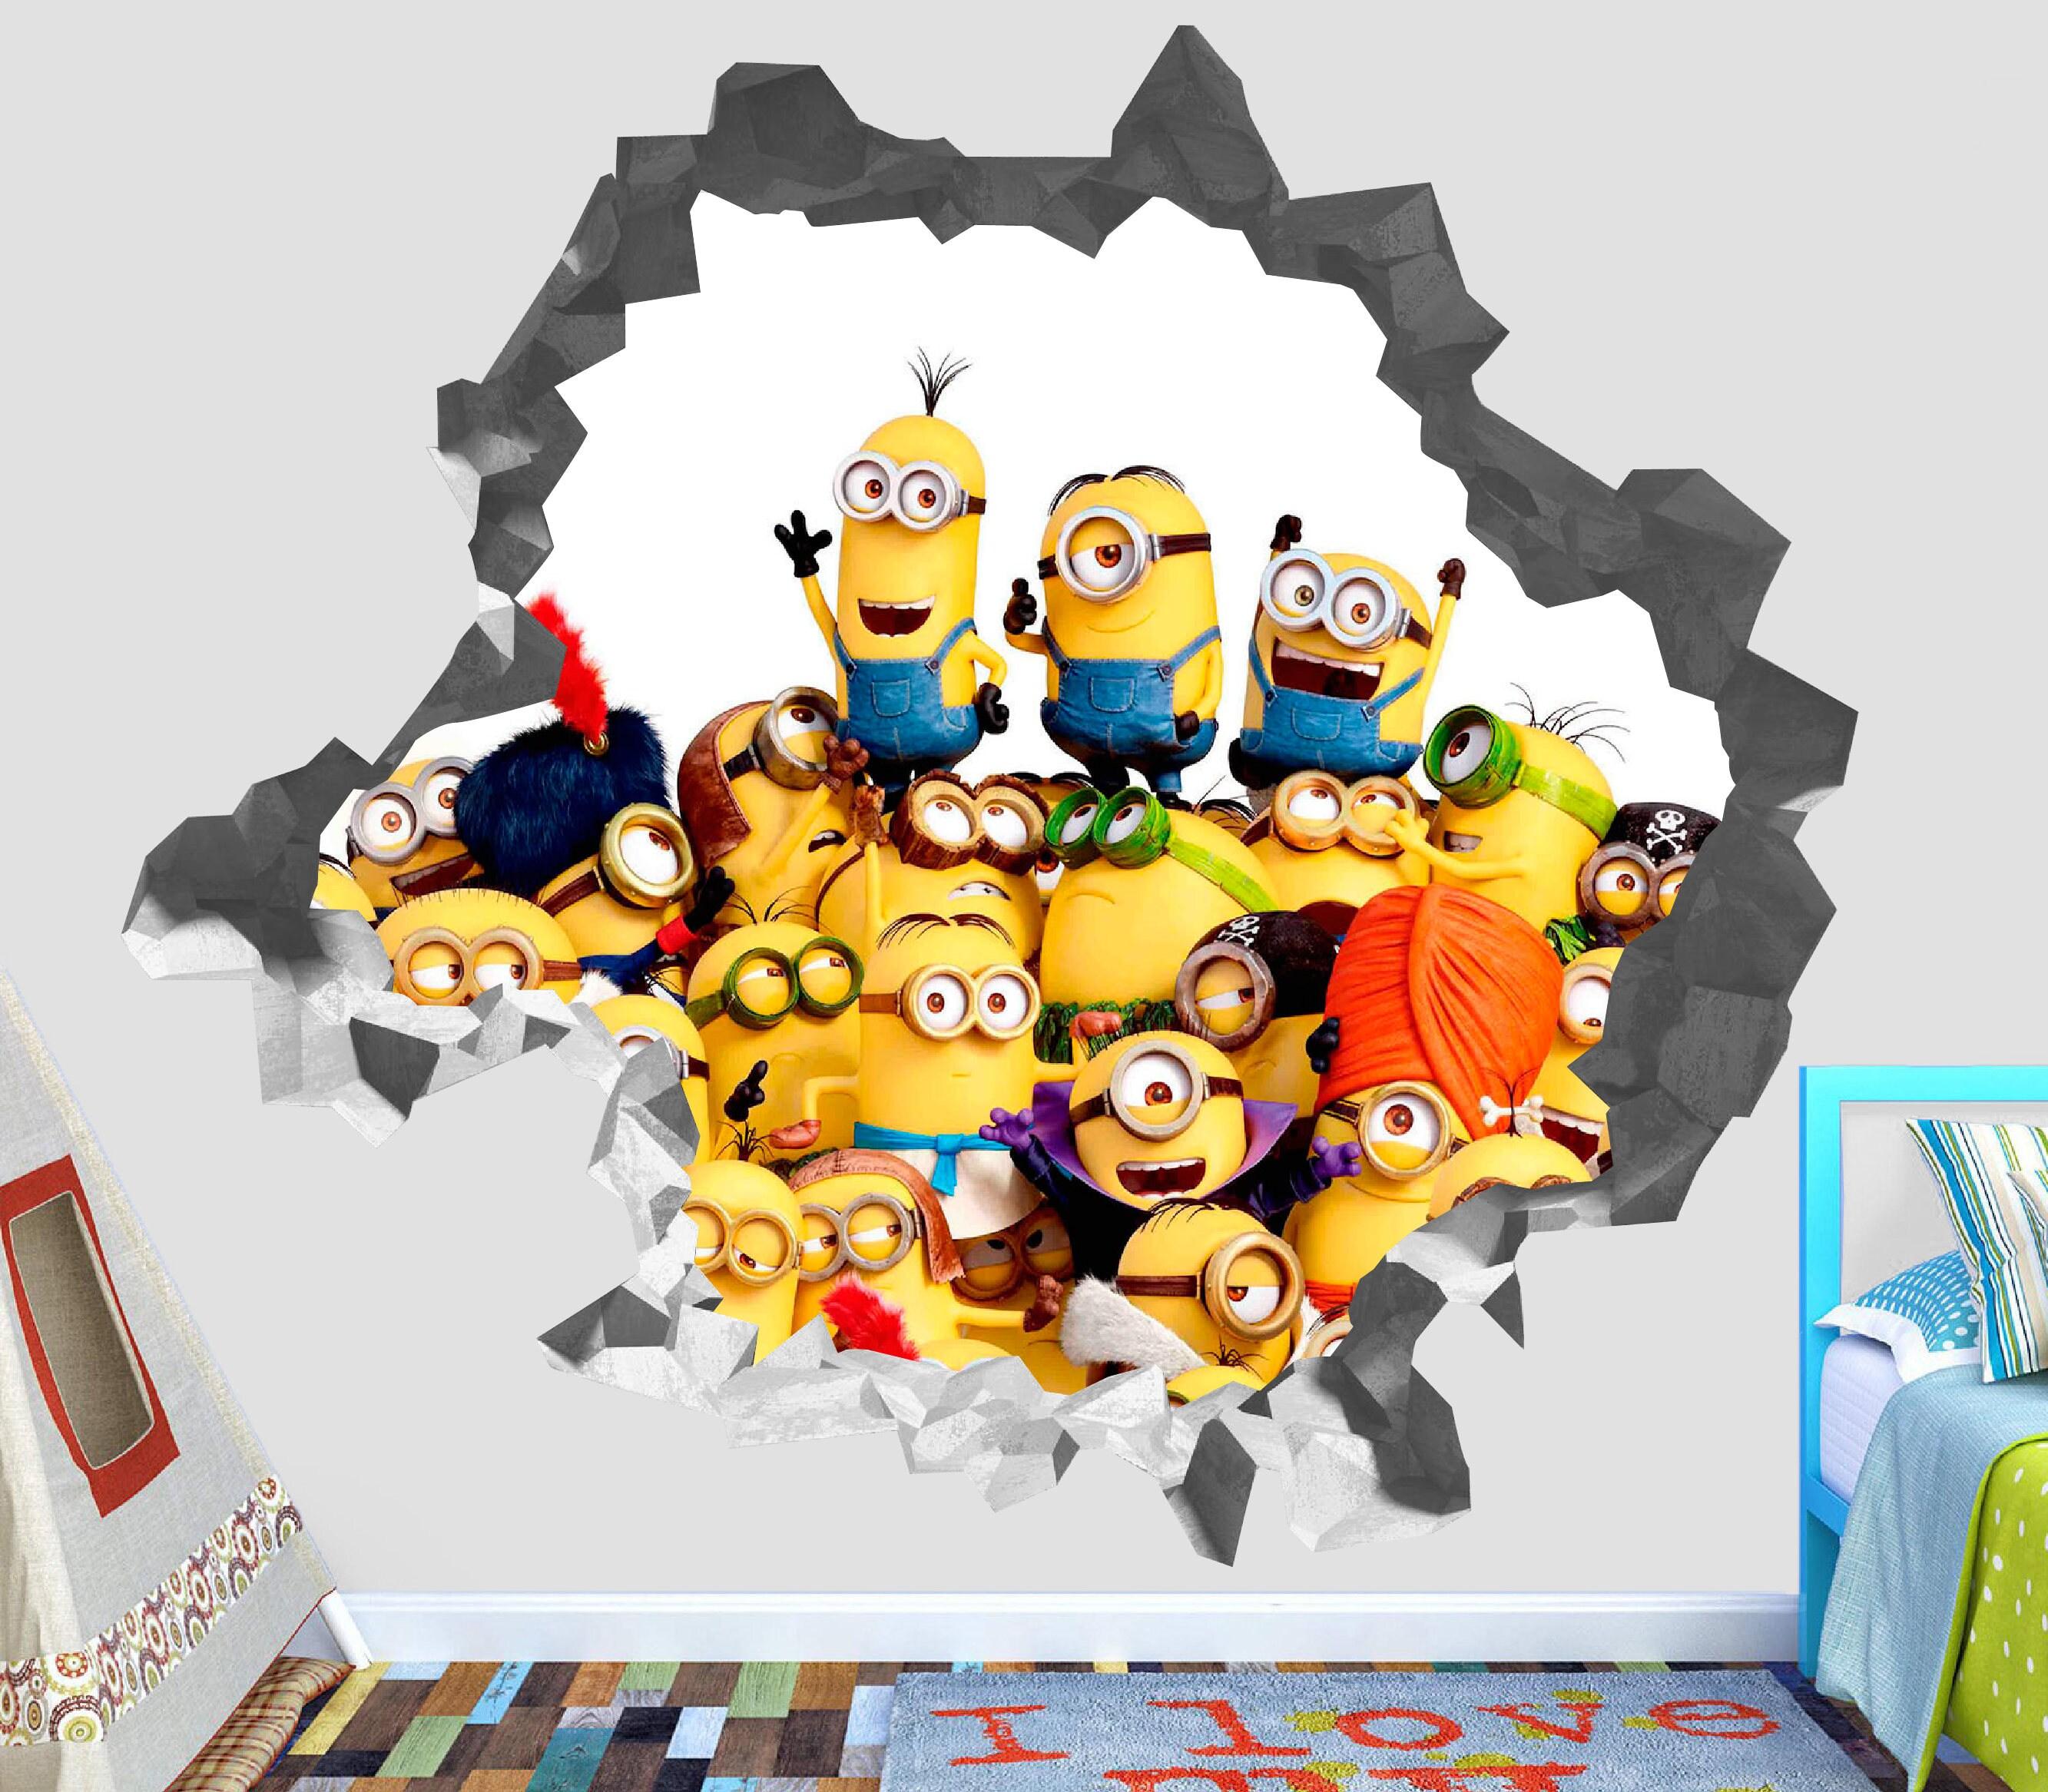 Miniones Despicable Me Wall Decal 3D Kids Sticker Art Decor Vinyl ...